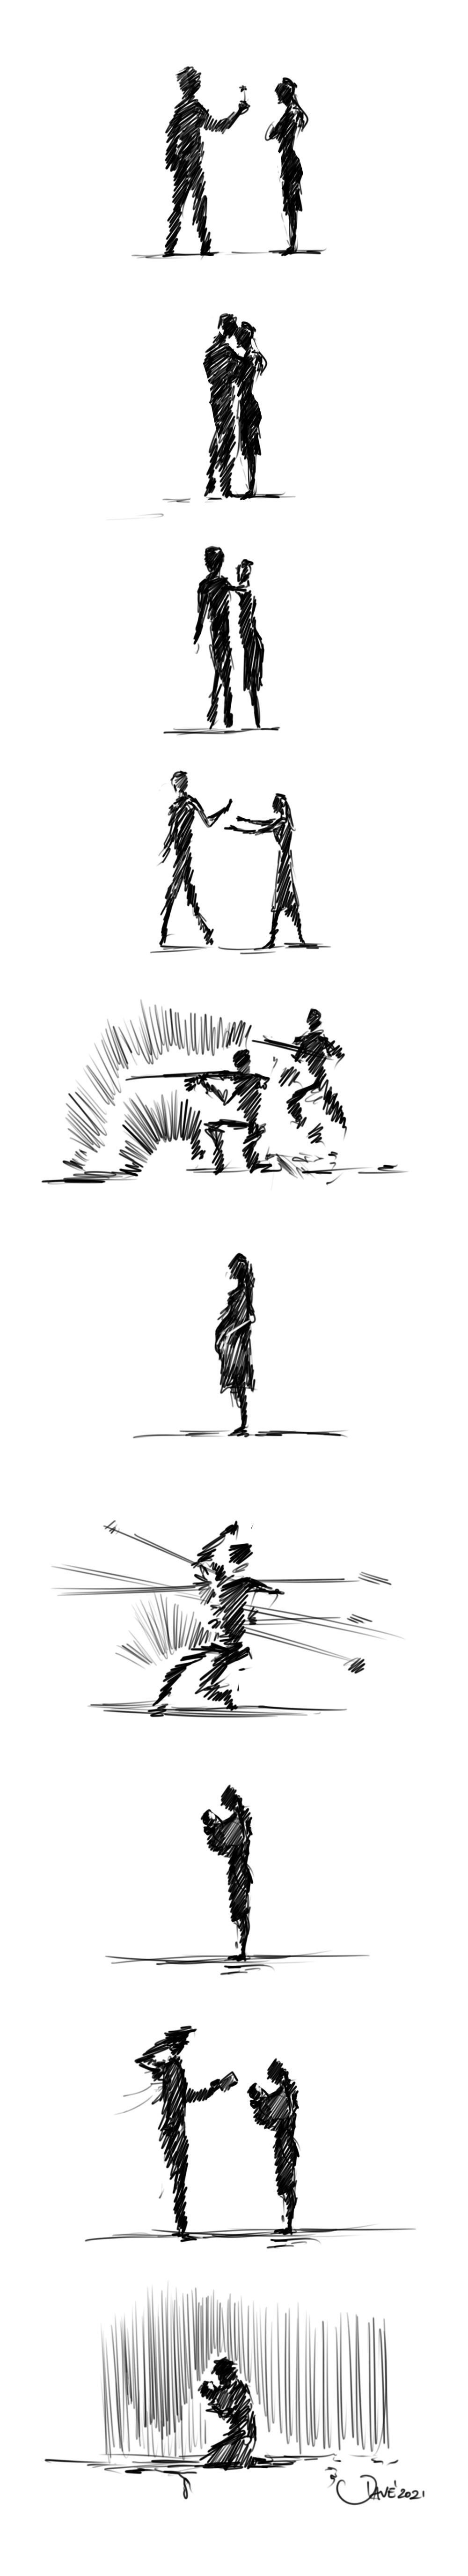 A sketchy Story